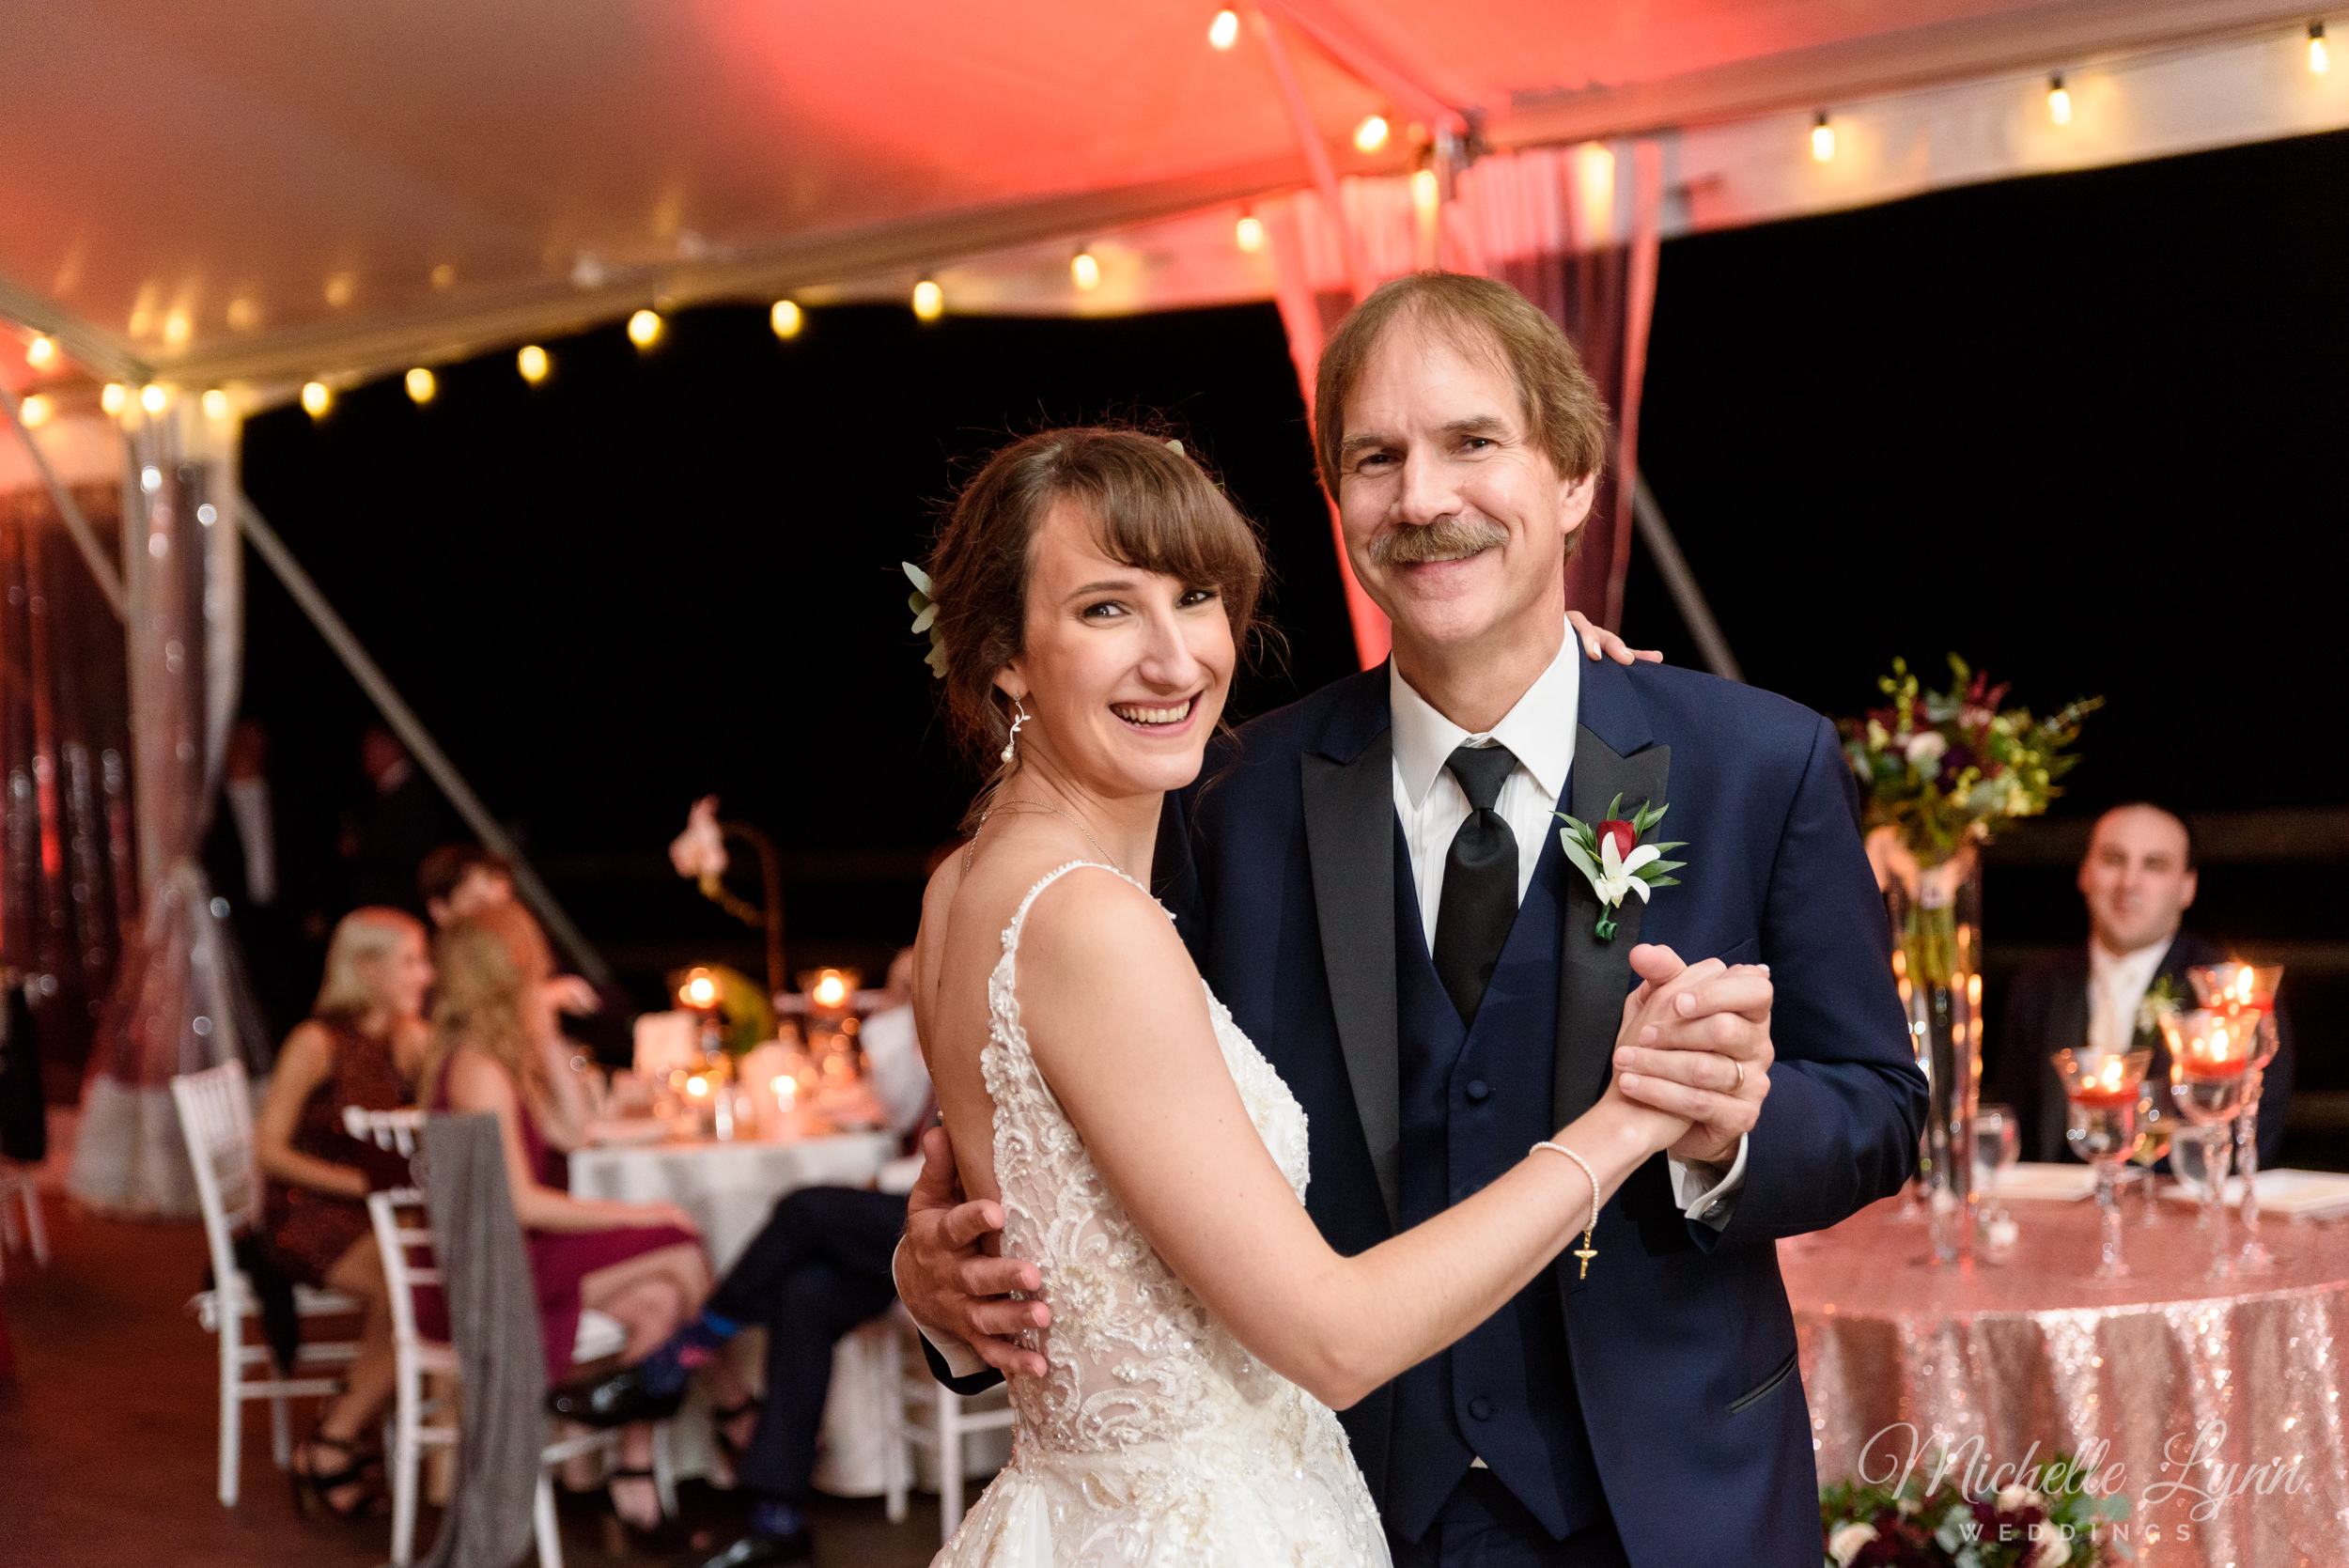 sand-castle-winery-pennsylvania-wedding-photography-104.jpg